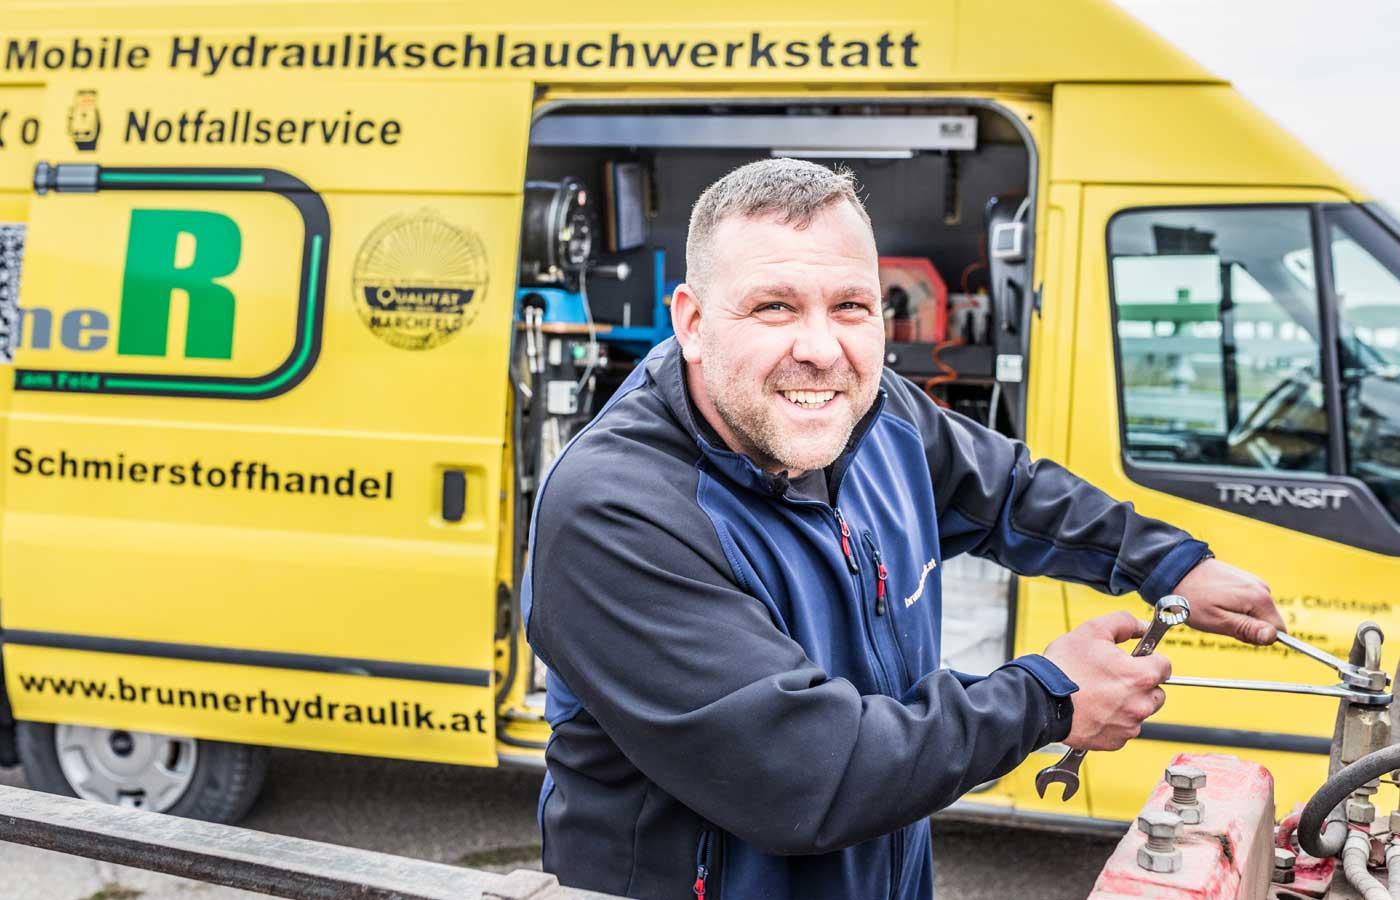 Brunner Hydraulik inhaber Christoph Brunner